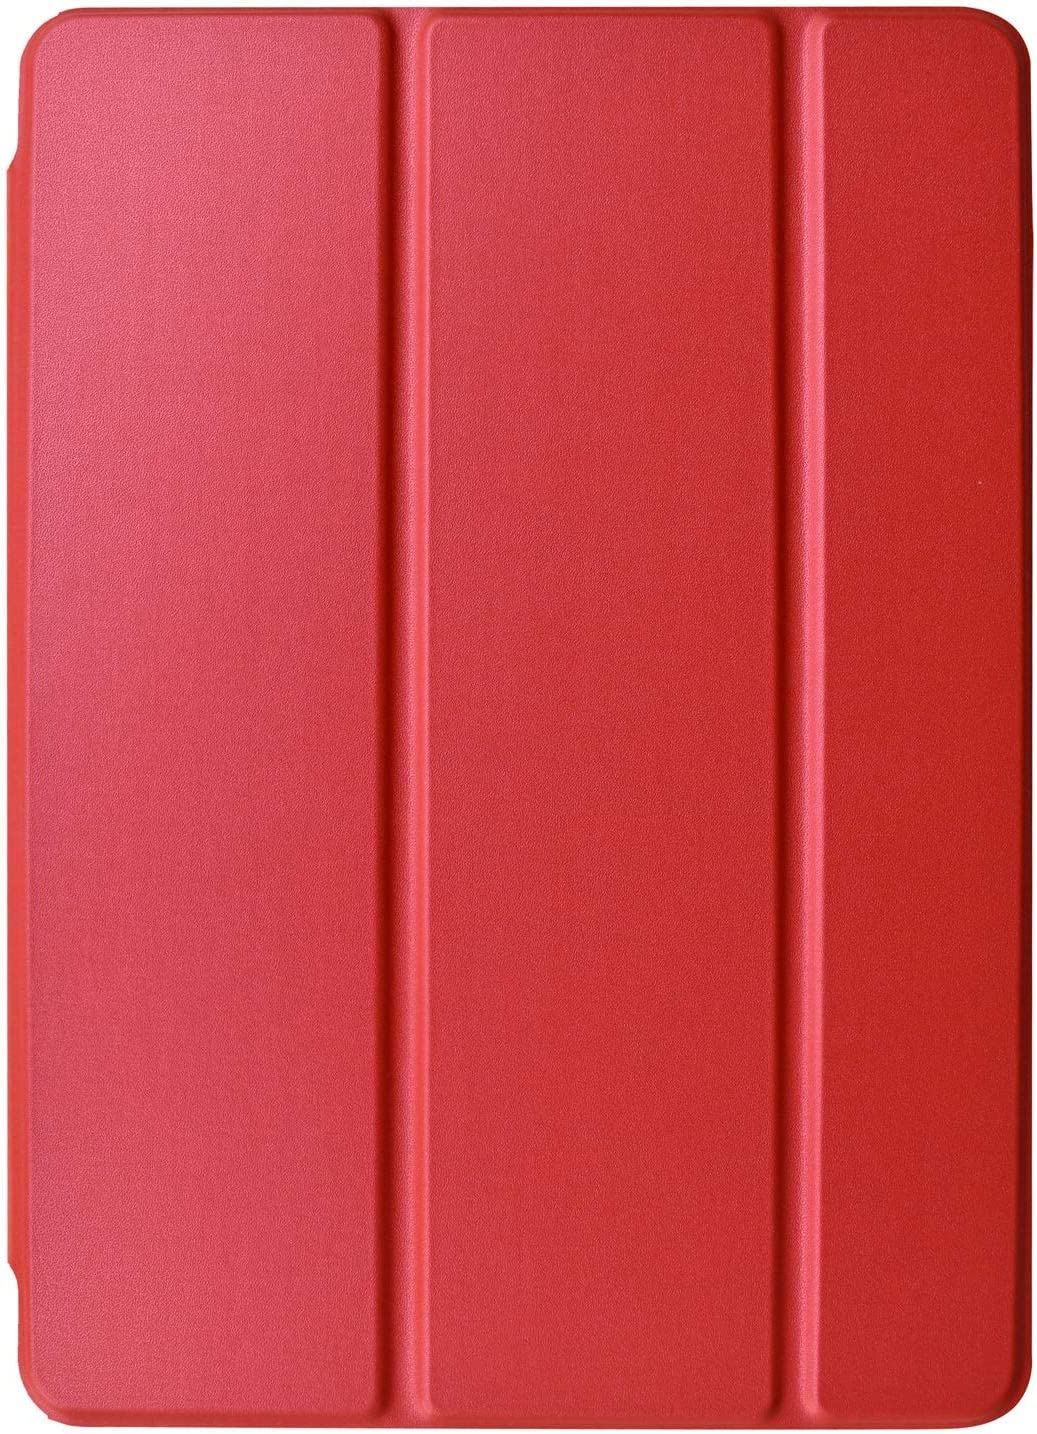 DuraSafe Cases for iPad 7.9 Inch Mini 4th [ Mini 2015 4 Gen ] MK6K2LL/A MK6J2LL/A MK6L2LL/A MK9J2LL/A MK9H2LL/A MK9G2LL/A Ultra Slim Smart Auto Sleep / Wake PC Cover - Red